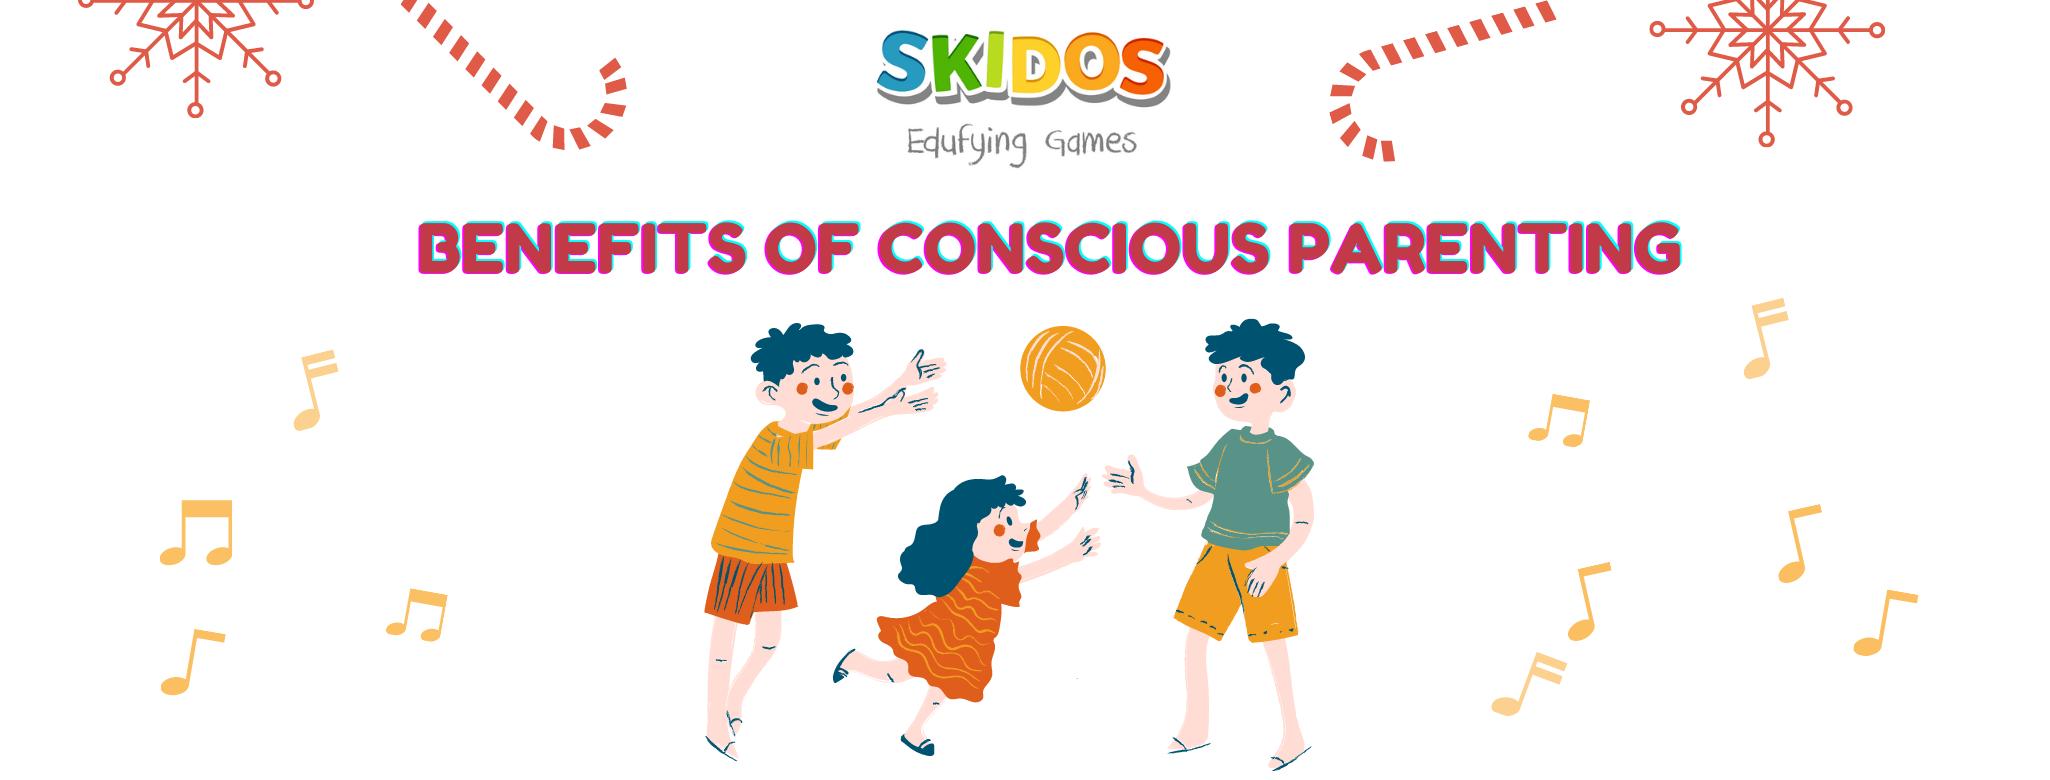 Benefits of conscious parenting